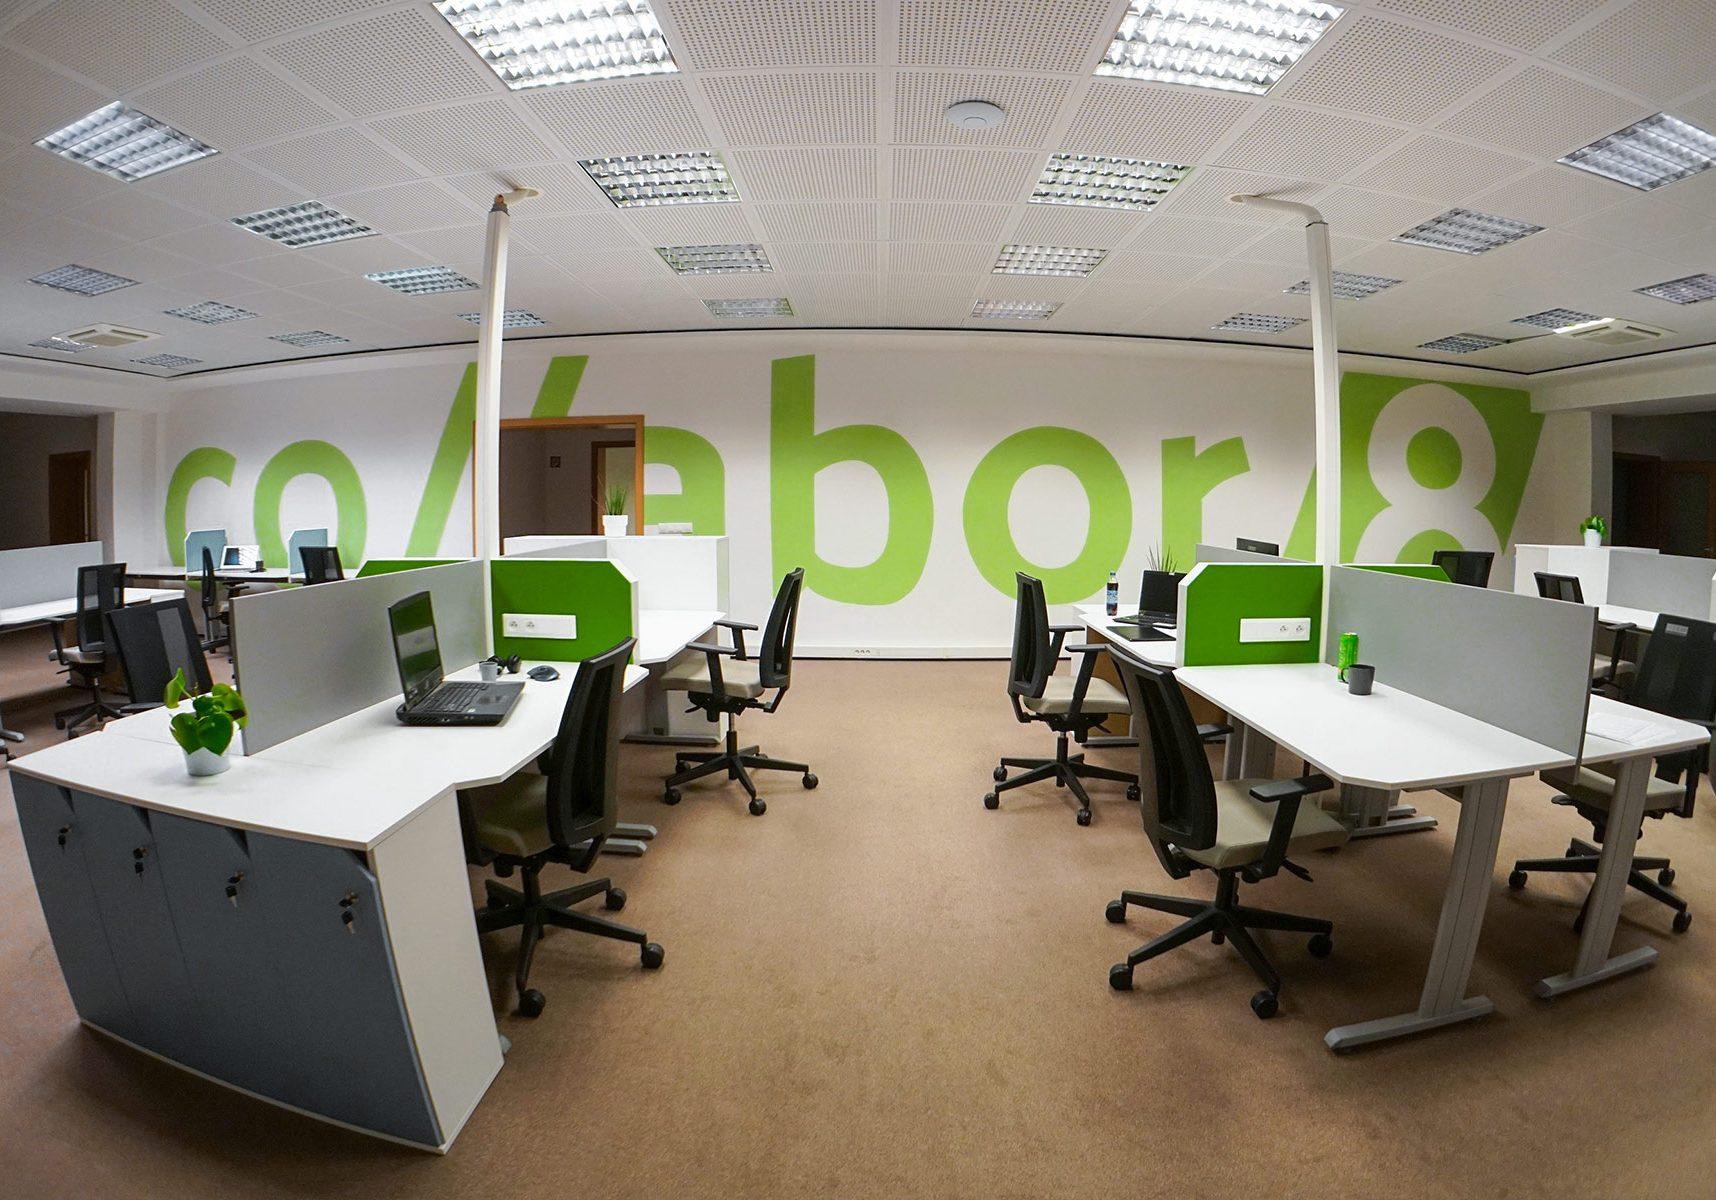 collabor8-4-veľký-openspace-sivý-panel_6